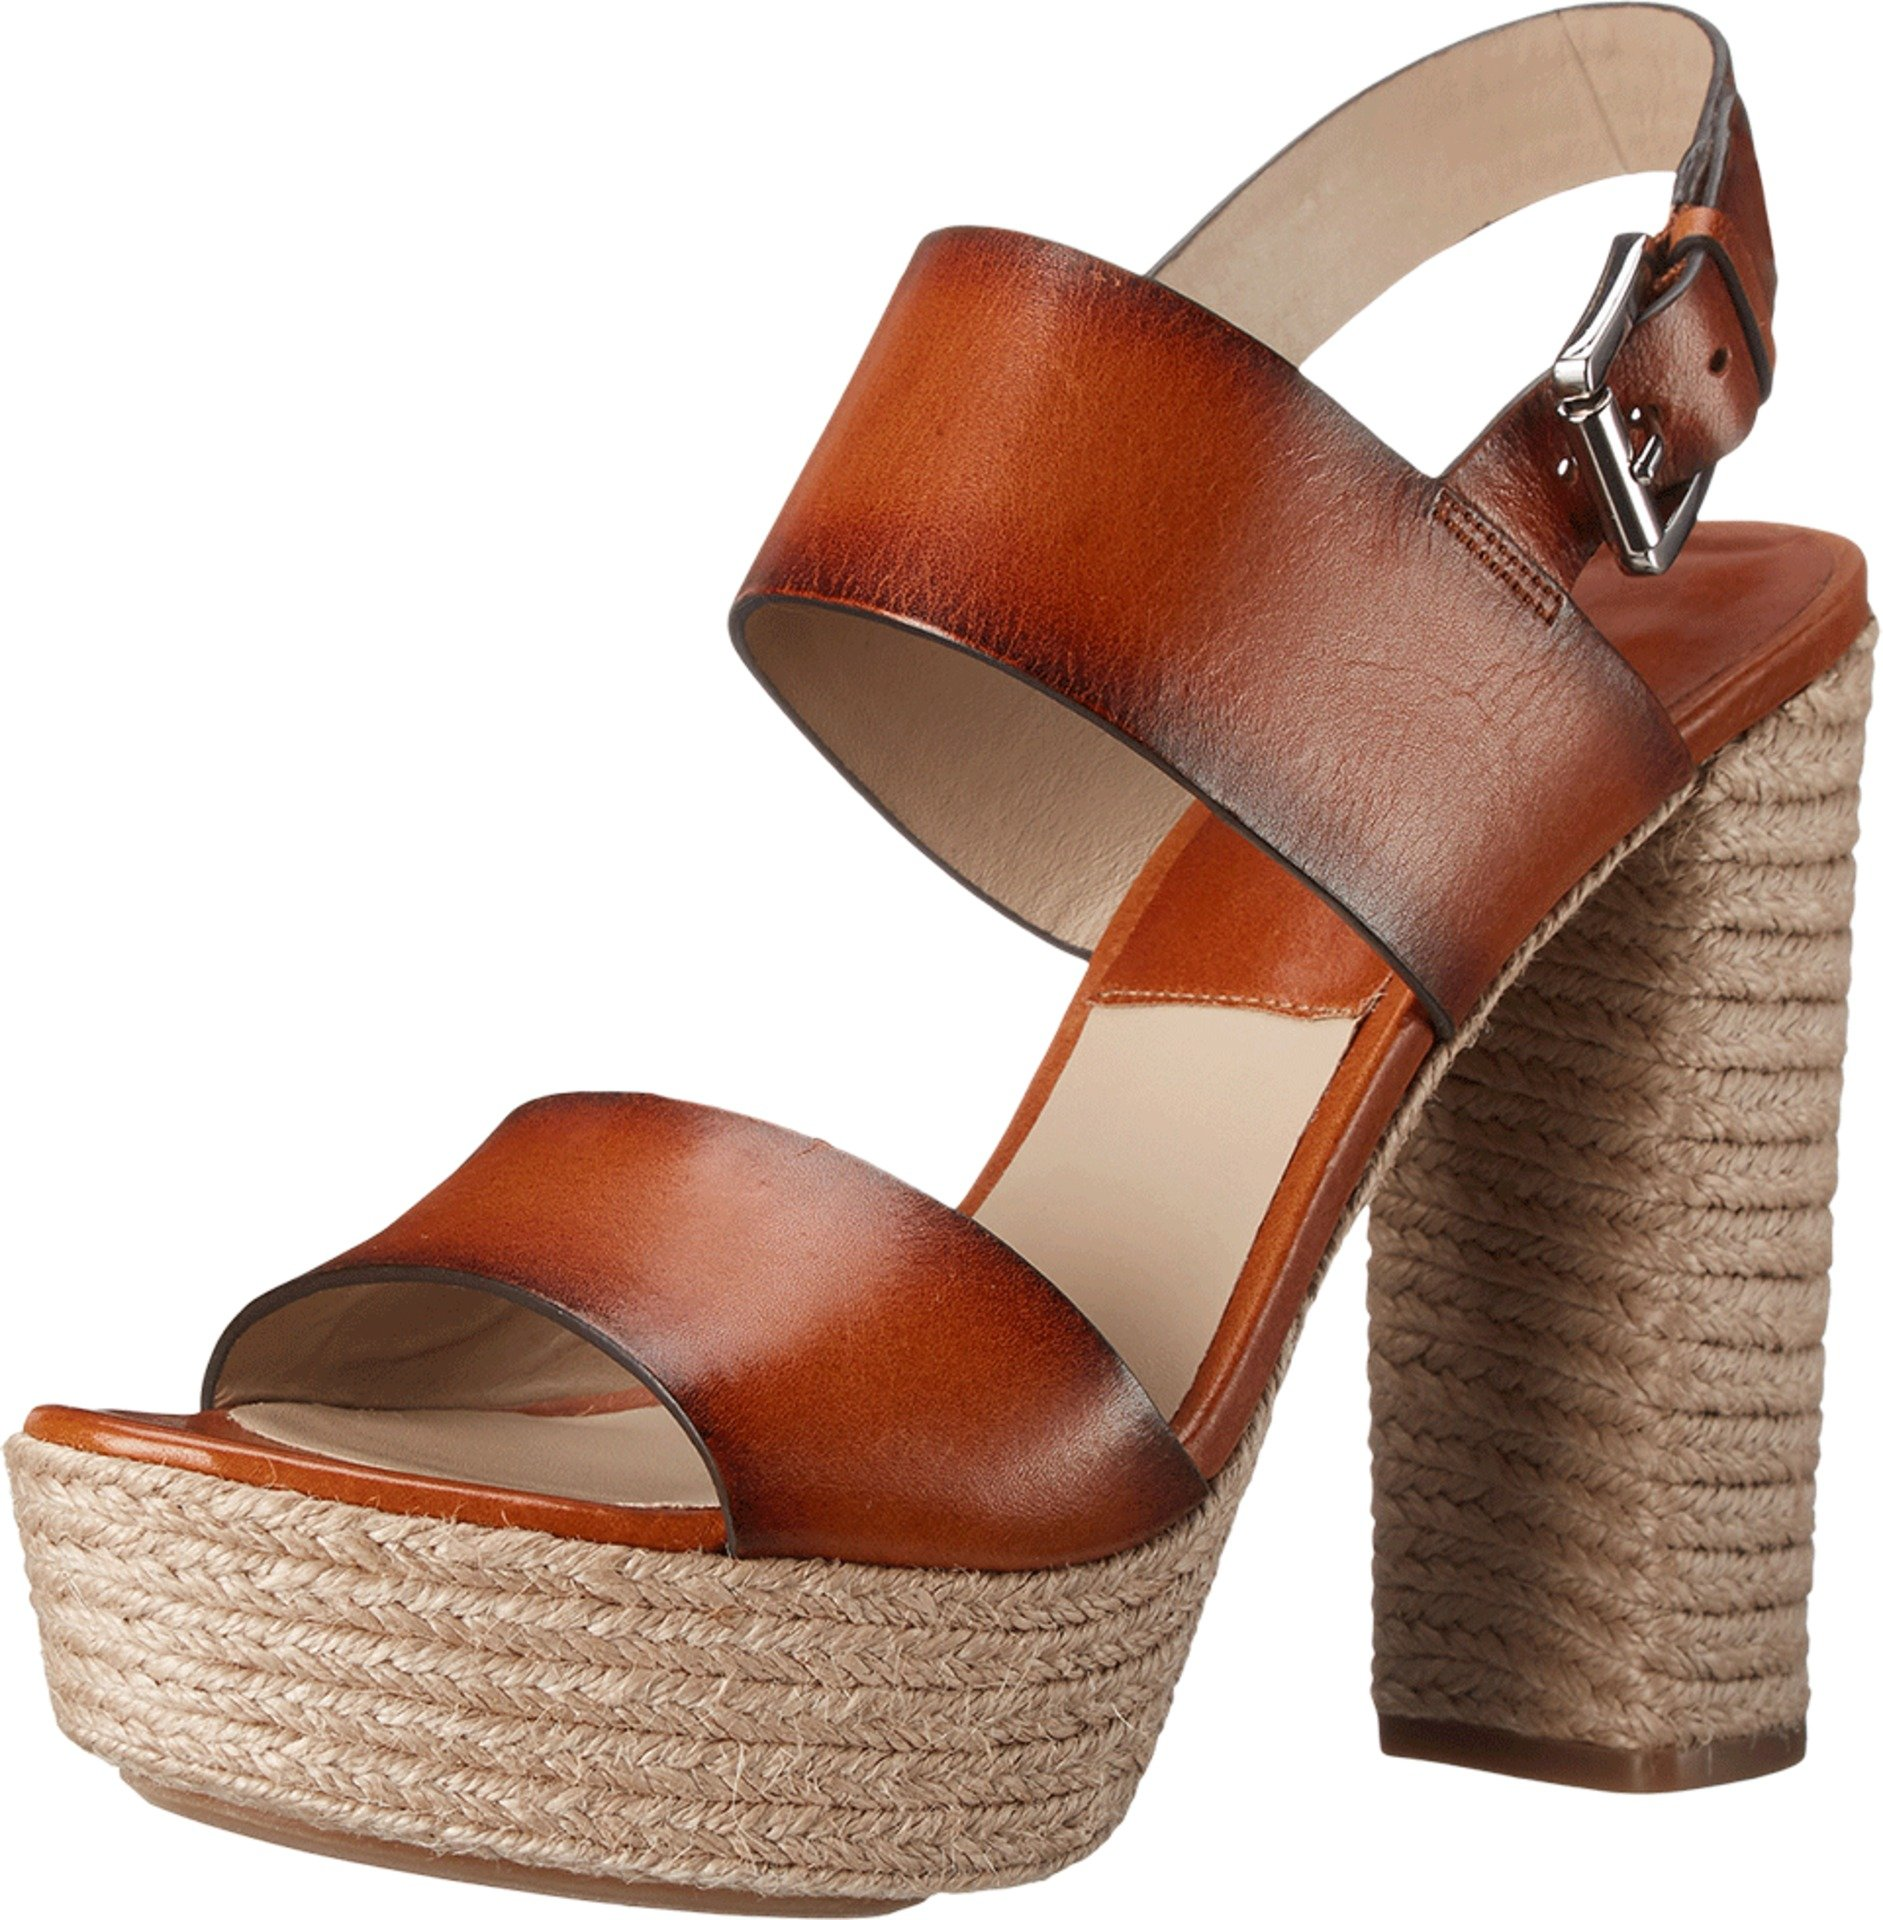 Michael Kors Women's Summer Luggage Burnished Vachetta/Jute Sandal 38.5 (US Women's 8.5) M